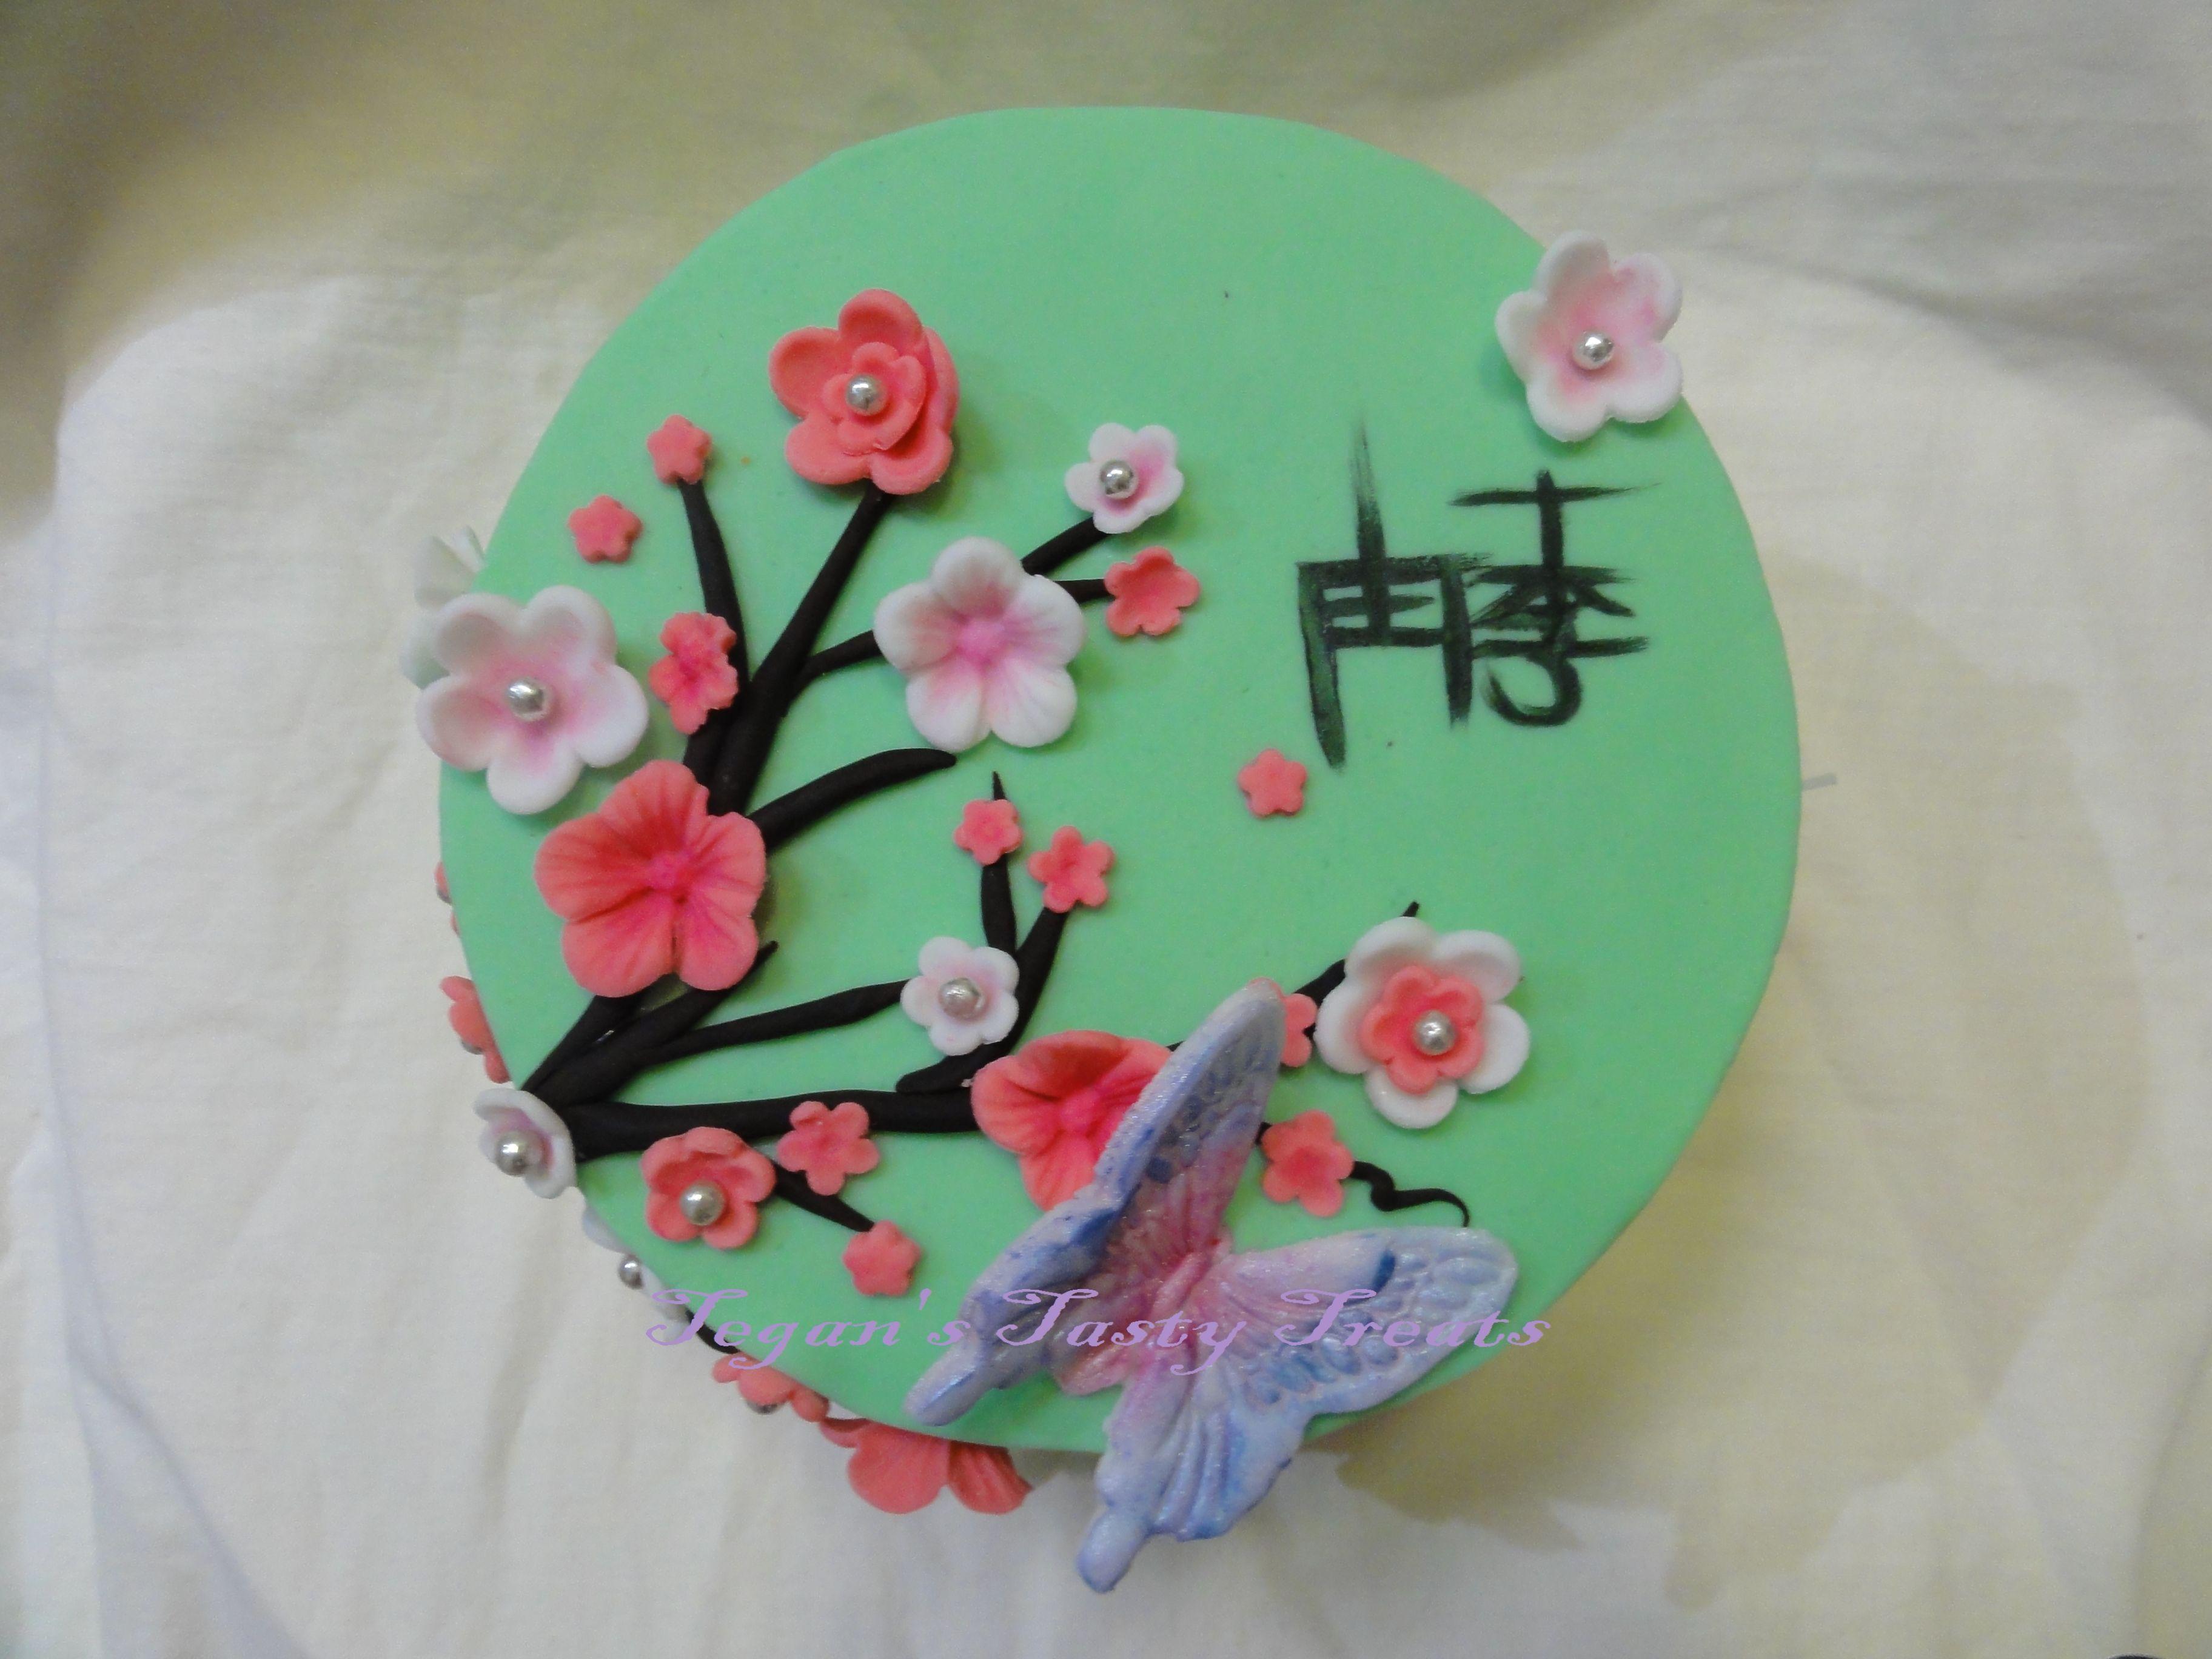 Top of the Japanese cherry blossom cake. Hand painted Kanji.